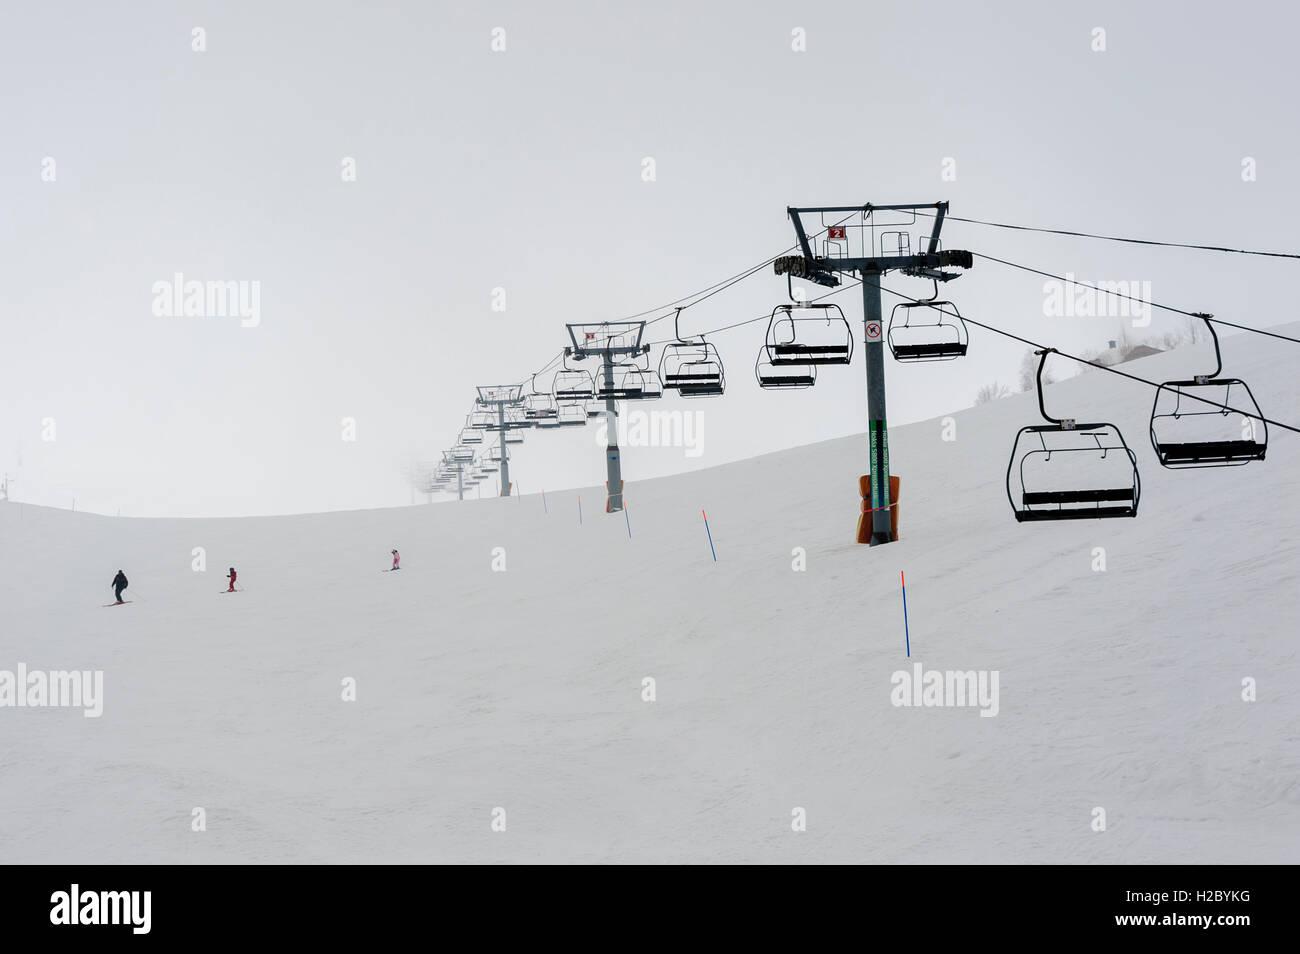 Chairlifts at Faraya (Mzaar Kfardebian) Ski resort during a snowy day, Lebanon - Stock Image